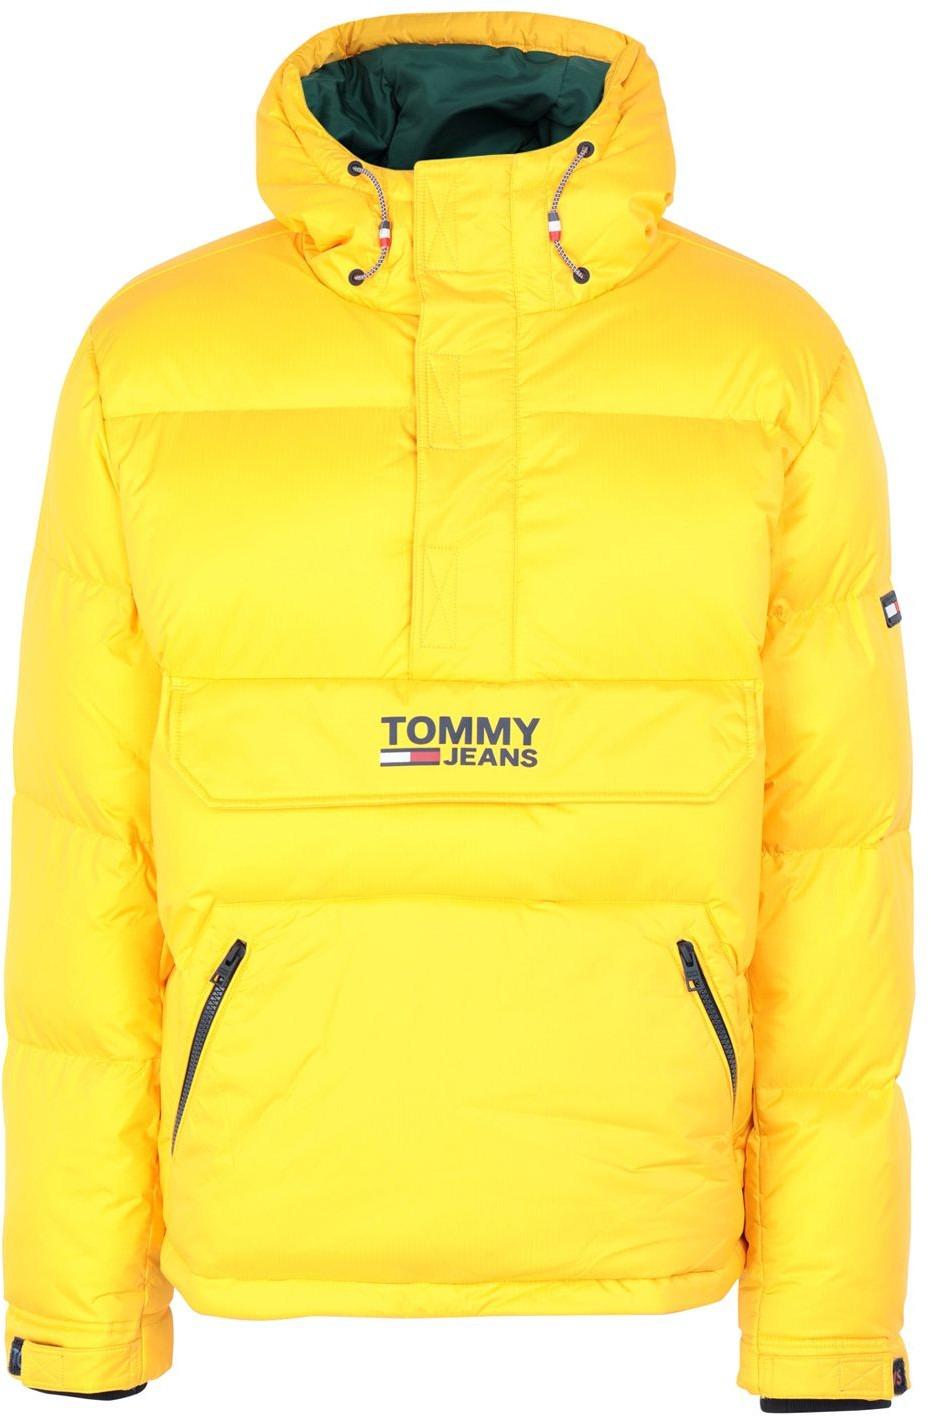 Sintetici Tommy Capispalla Sintetici Piumini Tommy Capispalla Piumini Jeans vqCnp